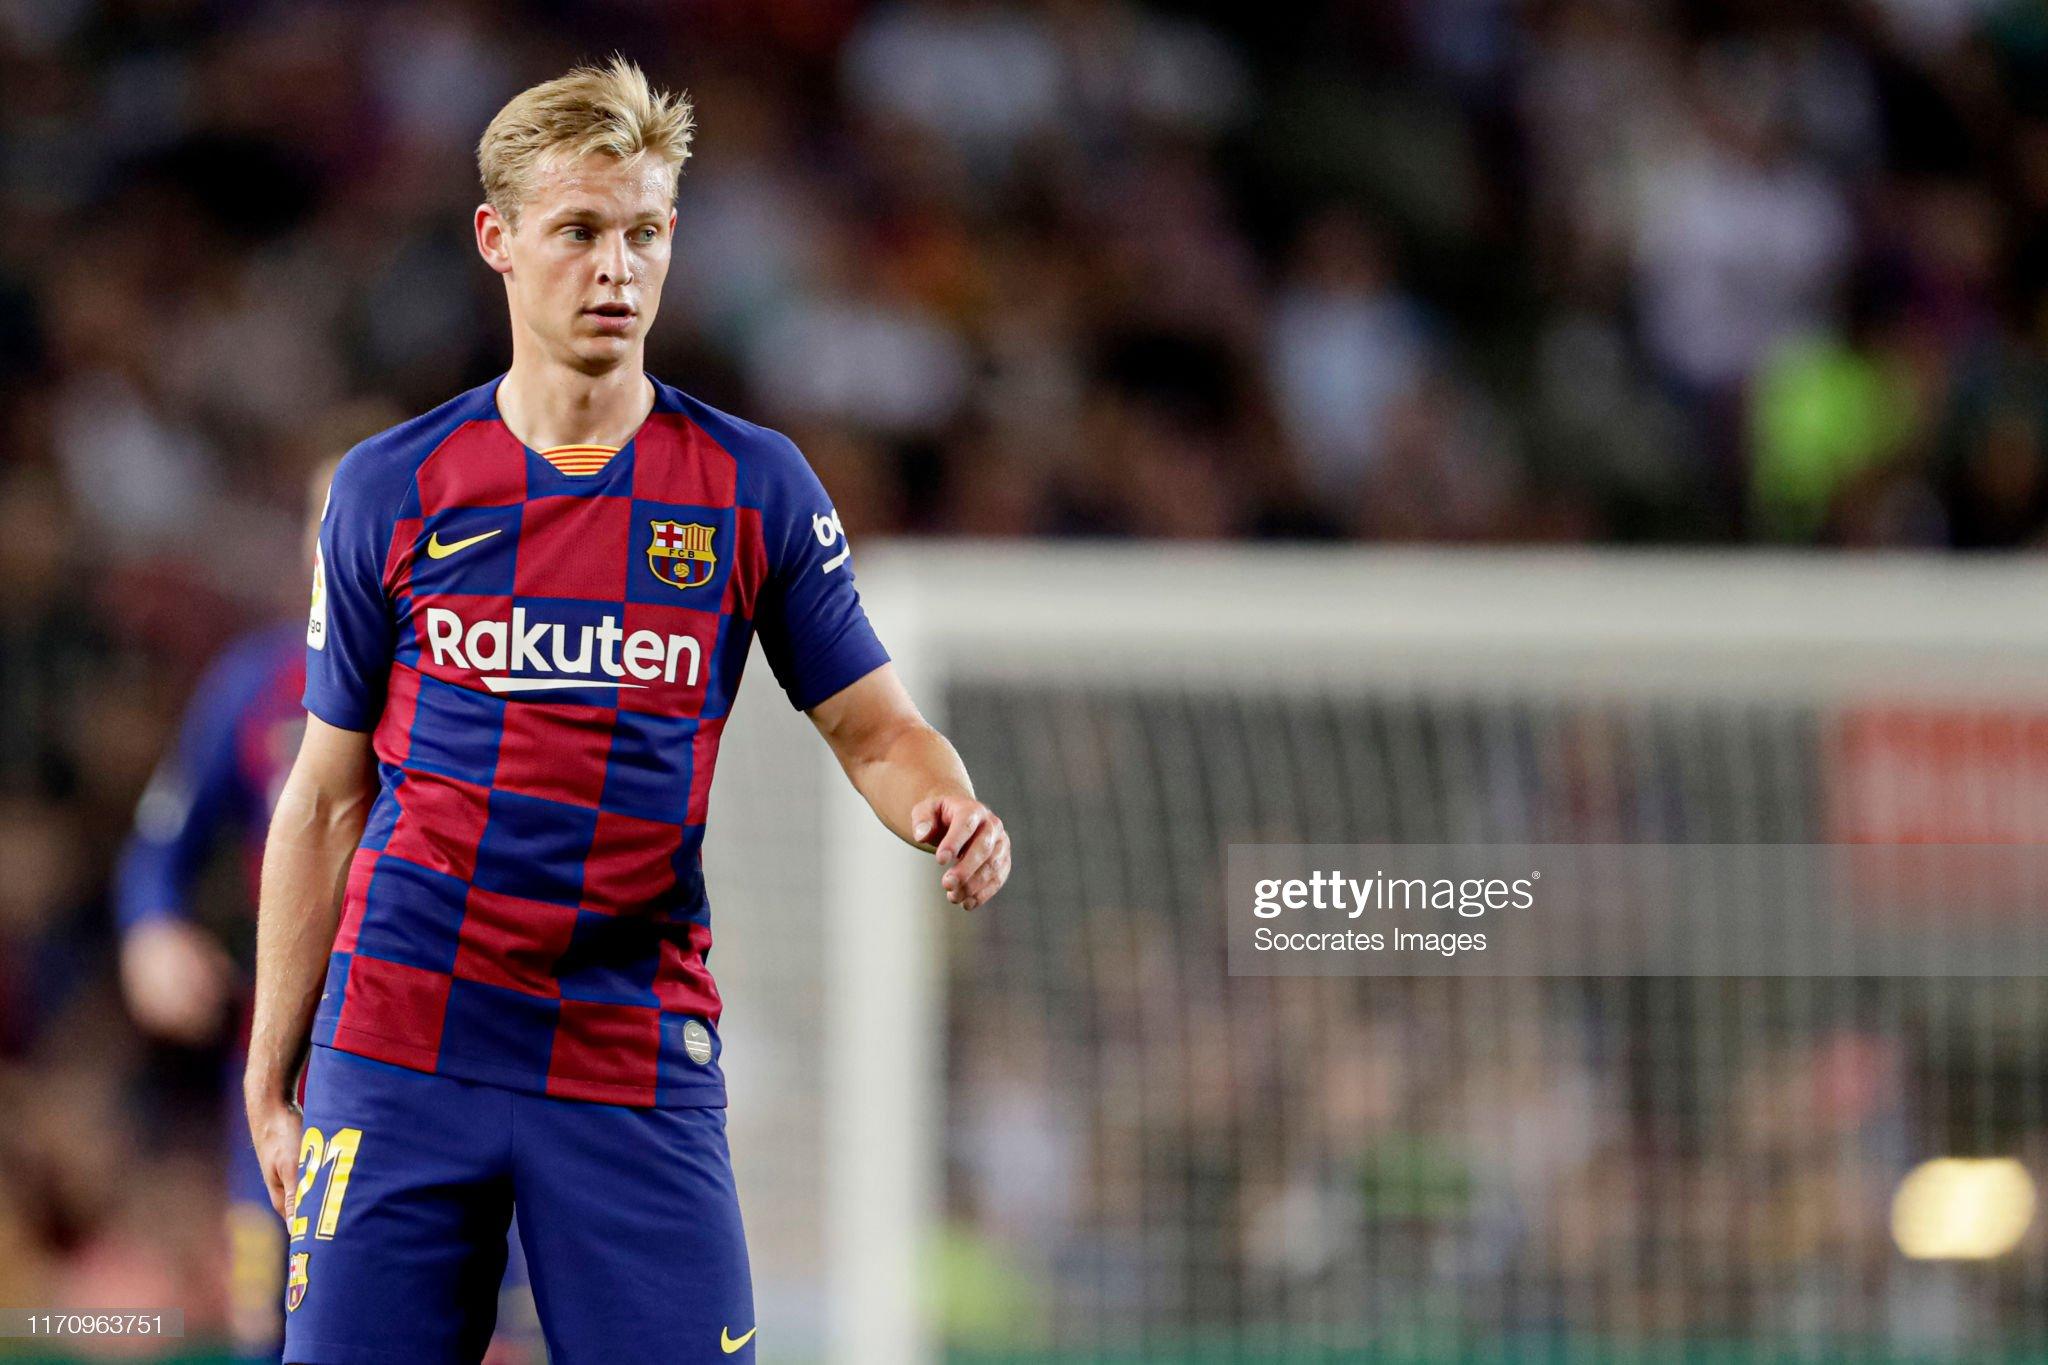 صور مباراة : برشلونة - فياريال 2-1 ( 24-09-2019 )  Frenkie-de-jong-of-fc-barcelona-during-the-la-liga-santander-match-picture-id1170963751?s=2048x2048